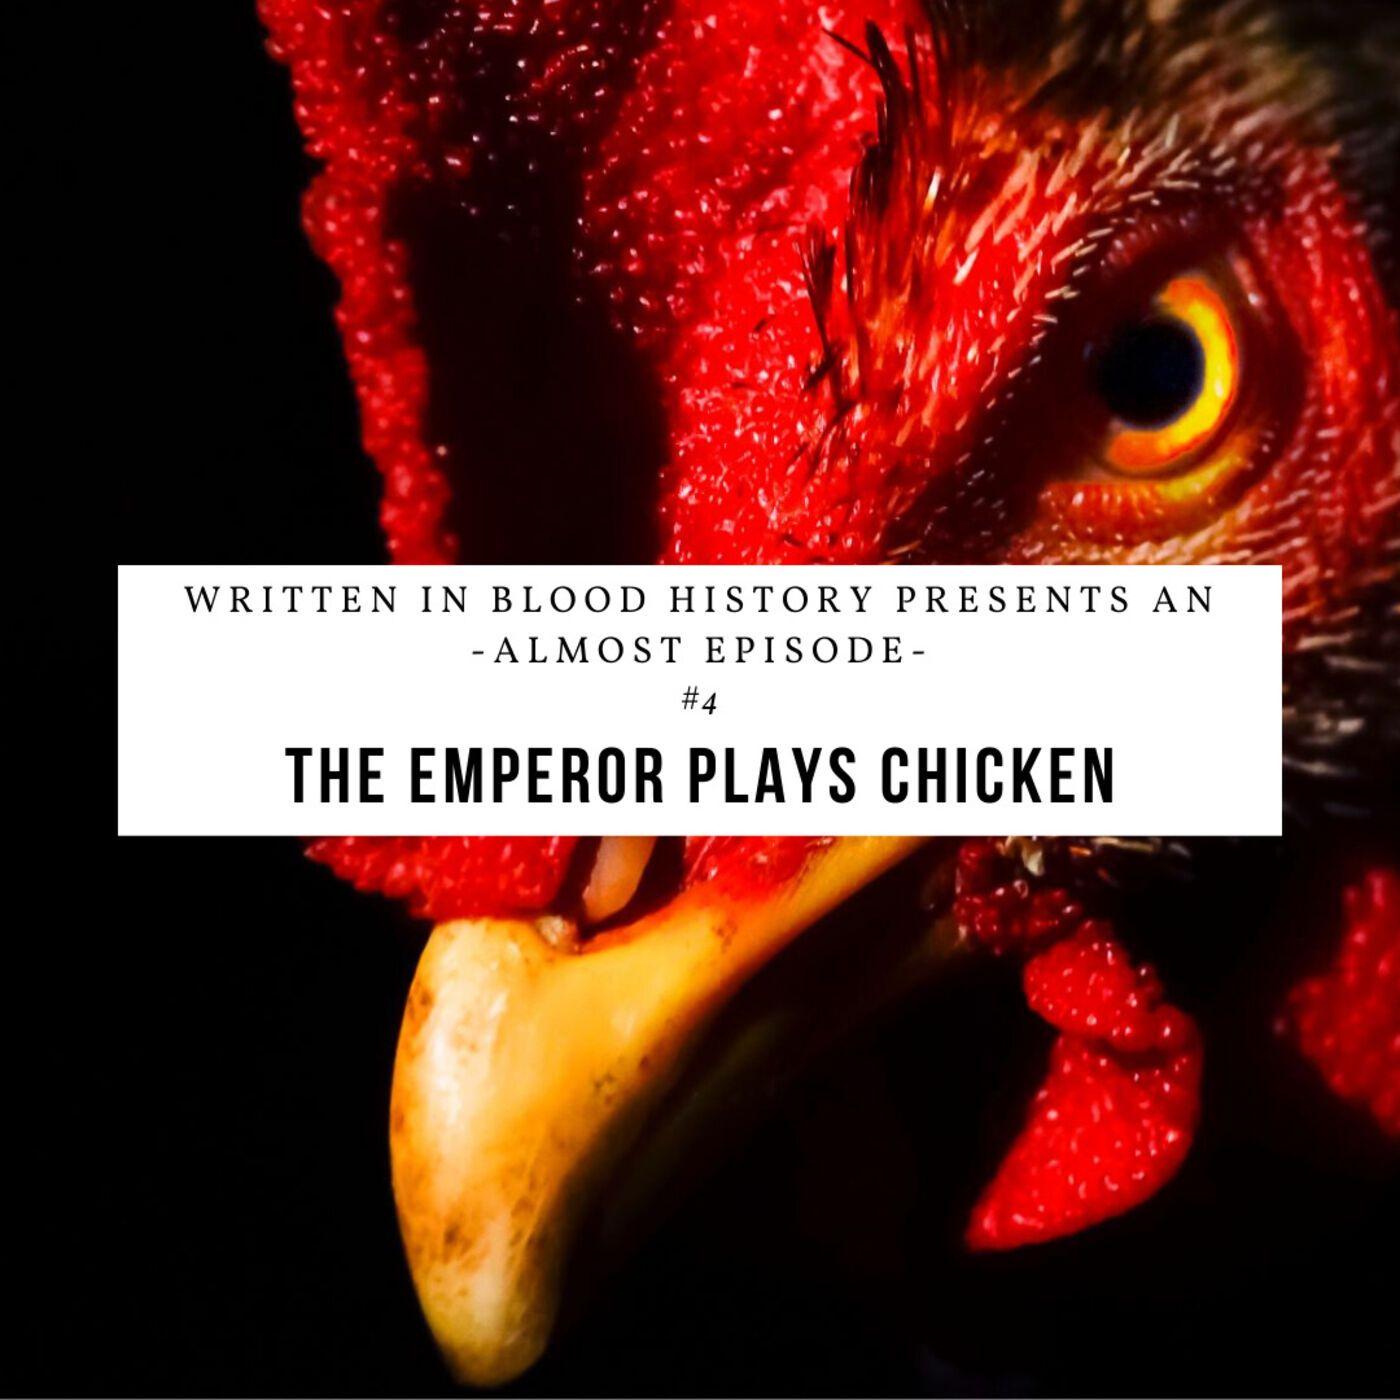 Almost Episode: The Emperor Plays Chicken